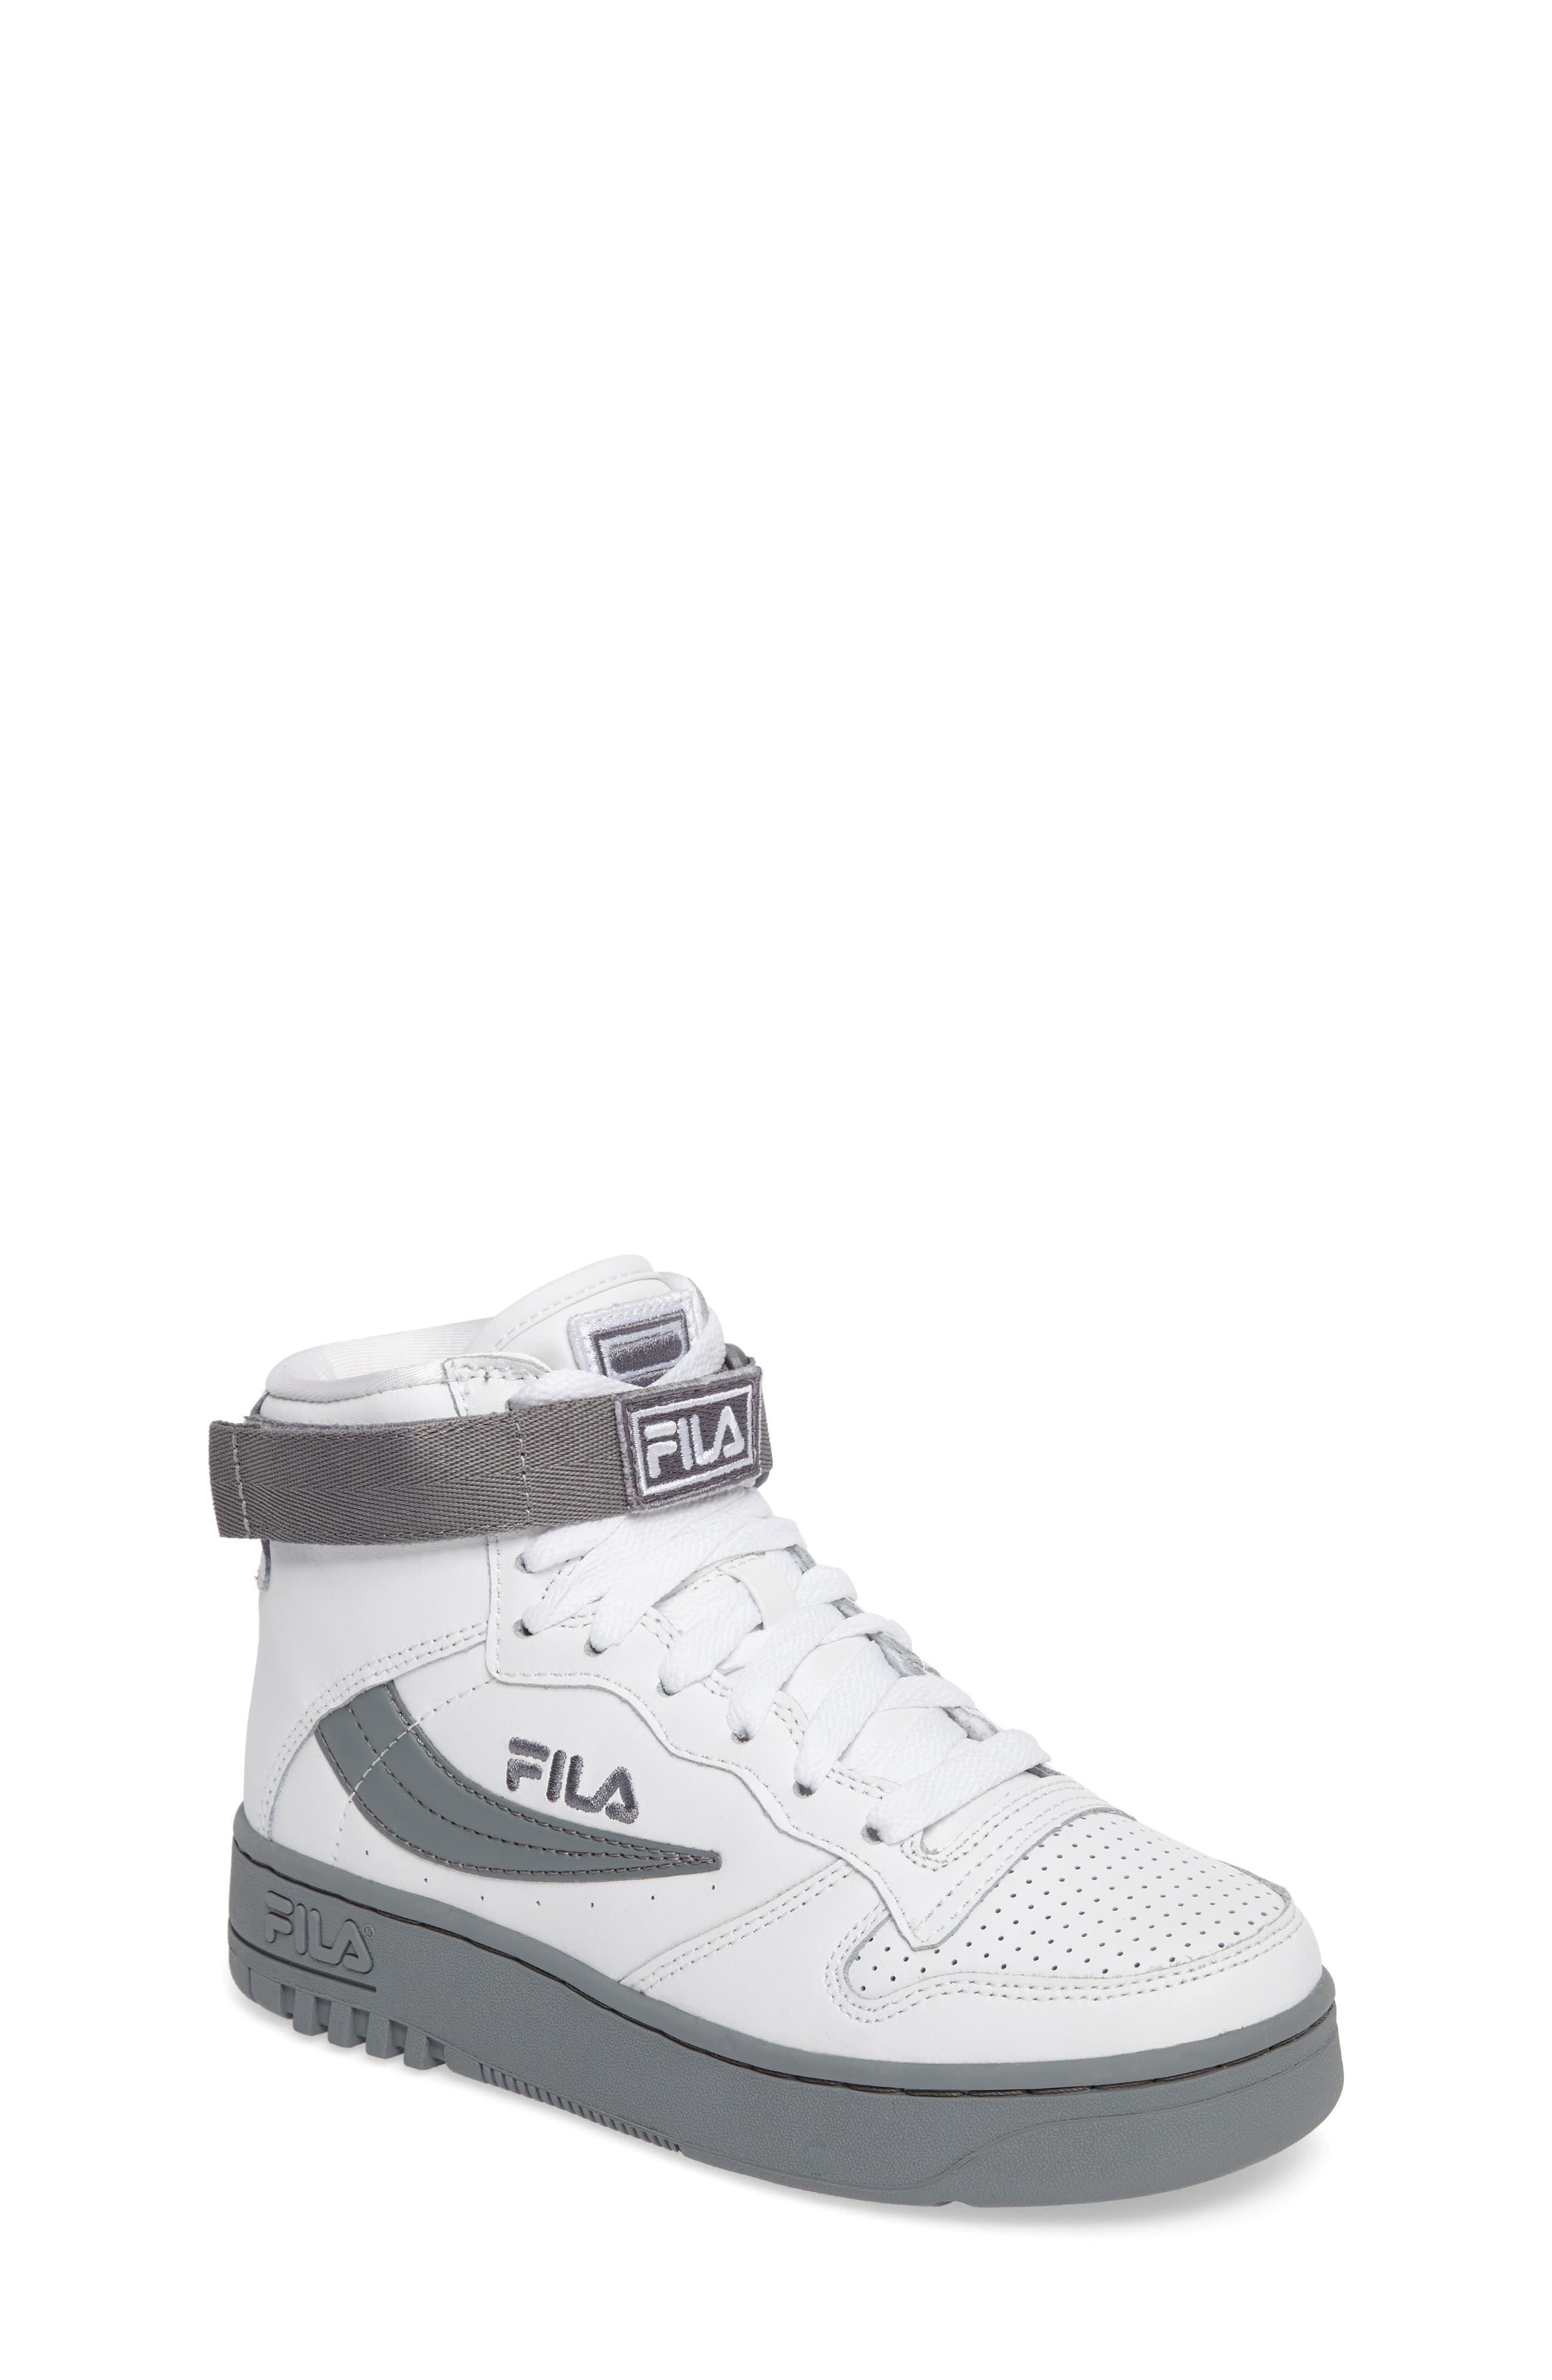 Main Image - FILA FX-100 High Top Sneaker (Big Kid)